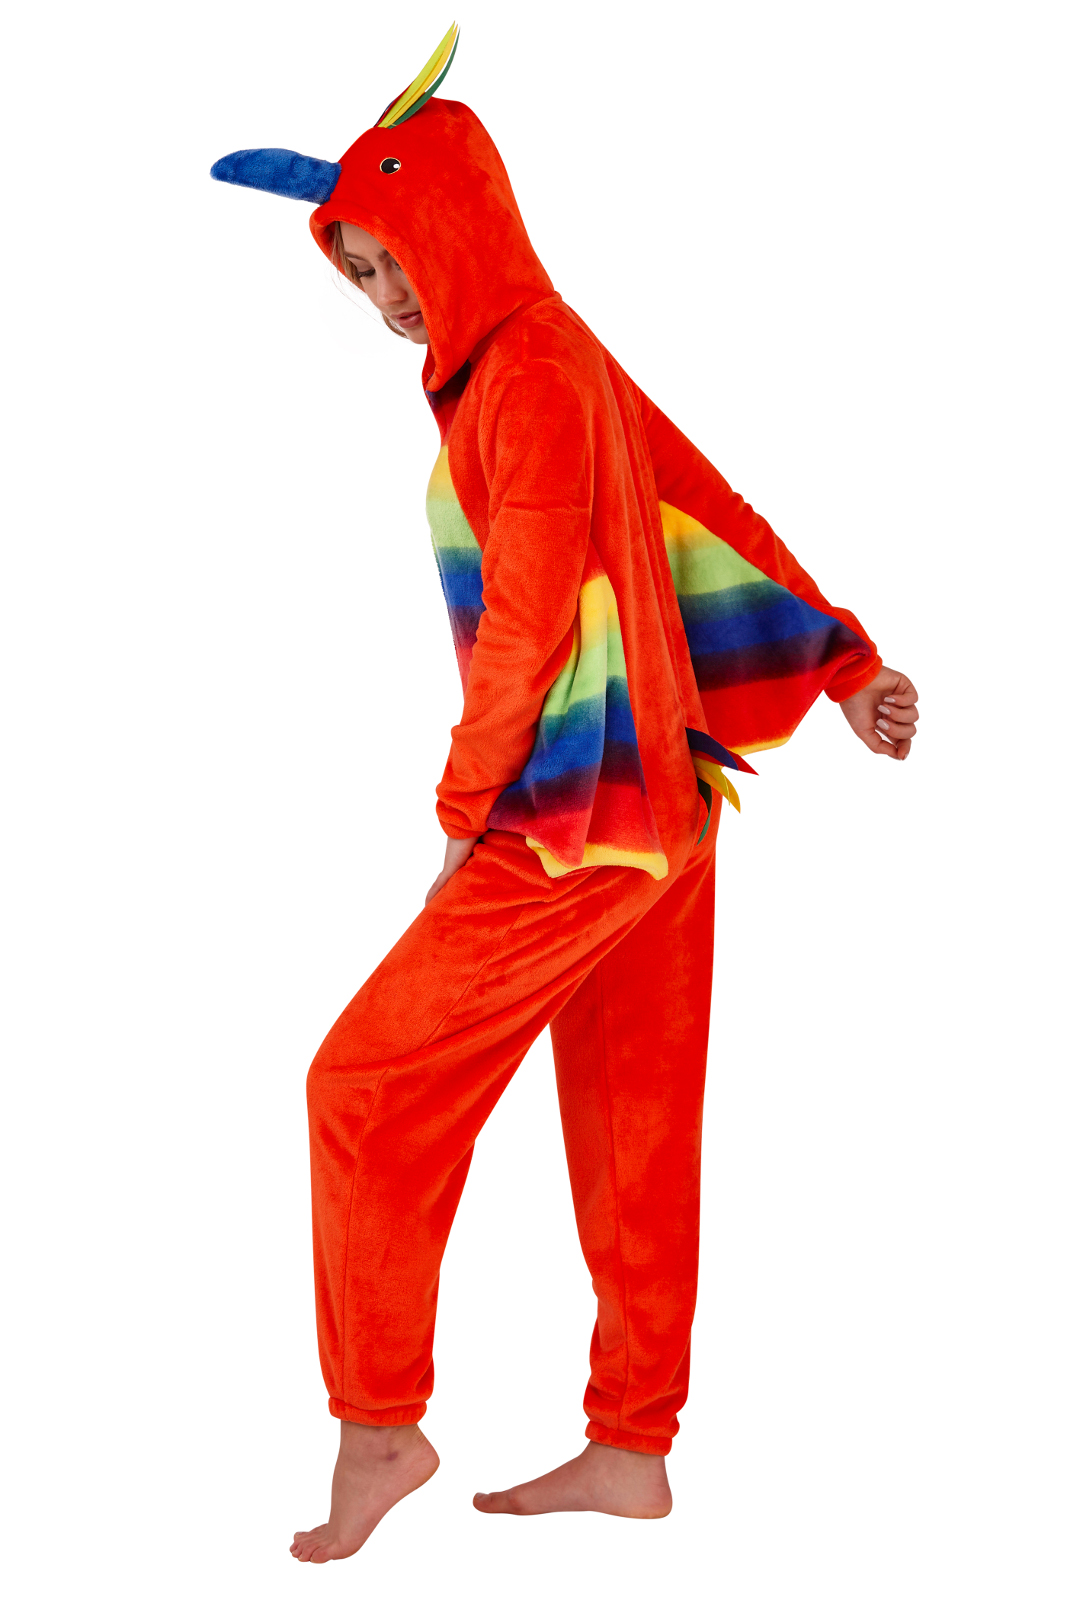 bdff2c64d Womens Parrot All In One Pyjamas 3D Character Novelty Fleece Fancy ...